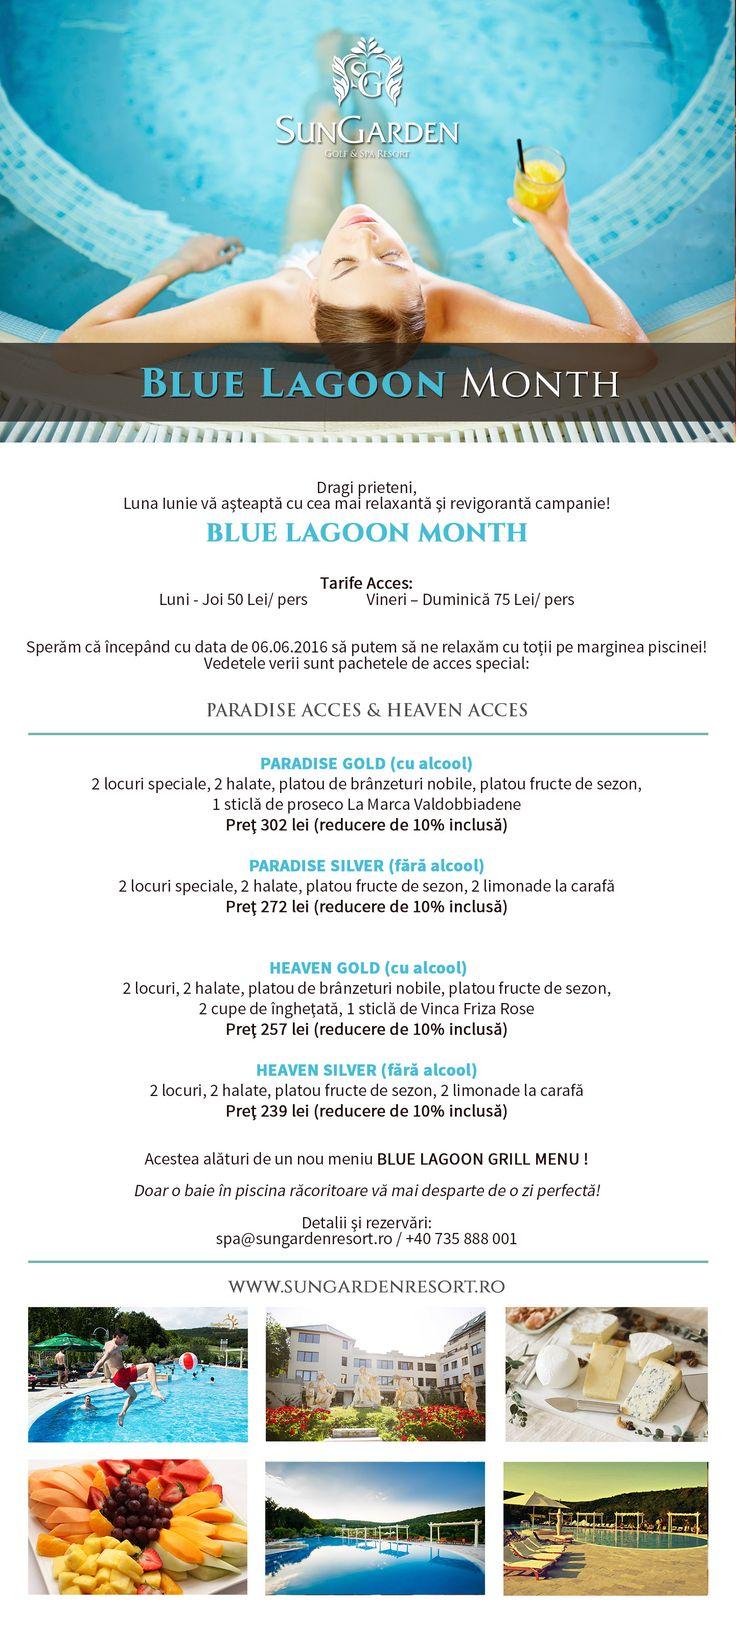 NEWSLETTER BLUE LAGOON MONTH